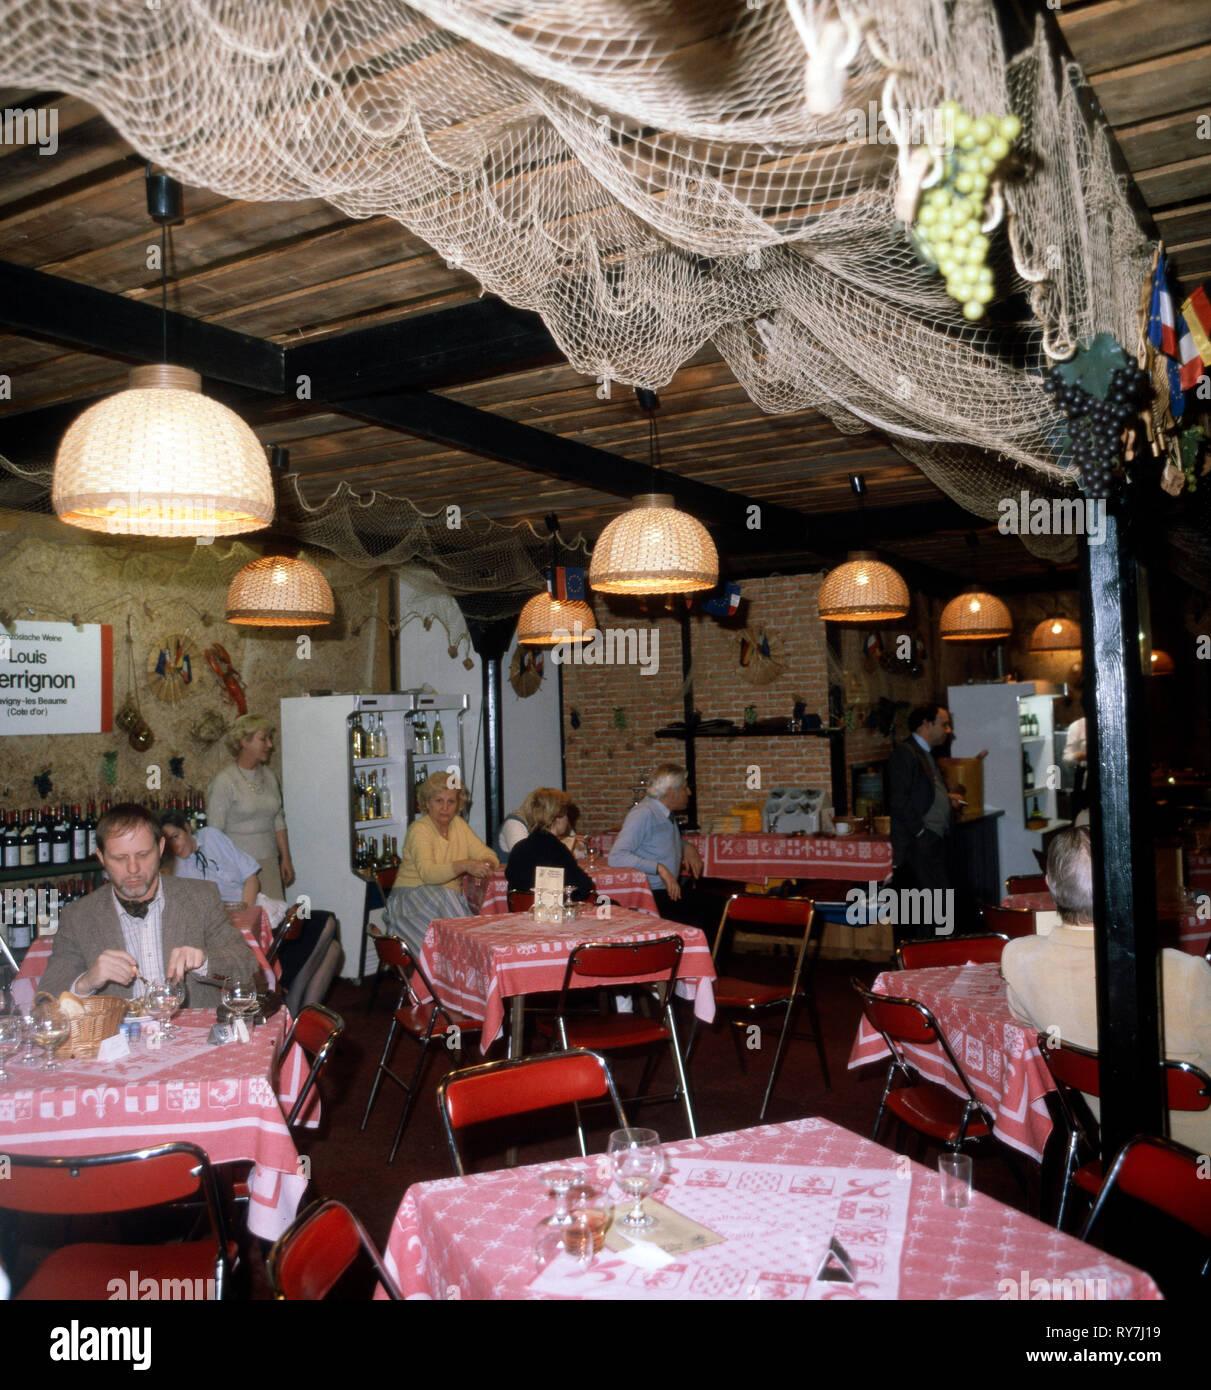 Ein französich angelehntes Restaurante, 1970er. Un restaurante de estilo francés, 1970 Foto de stock